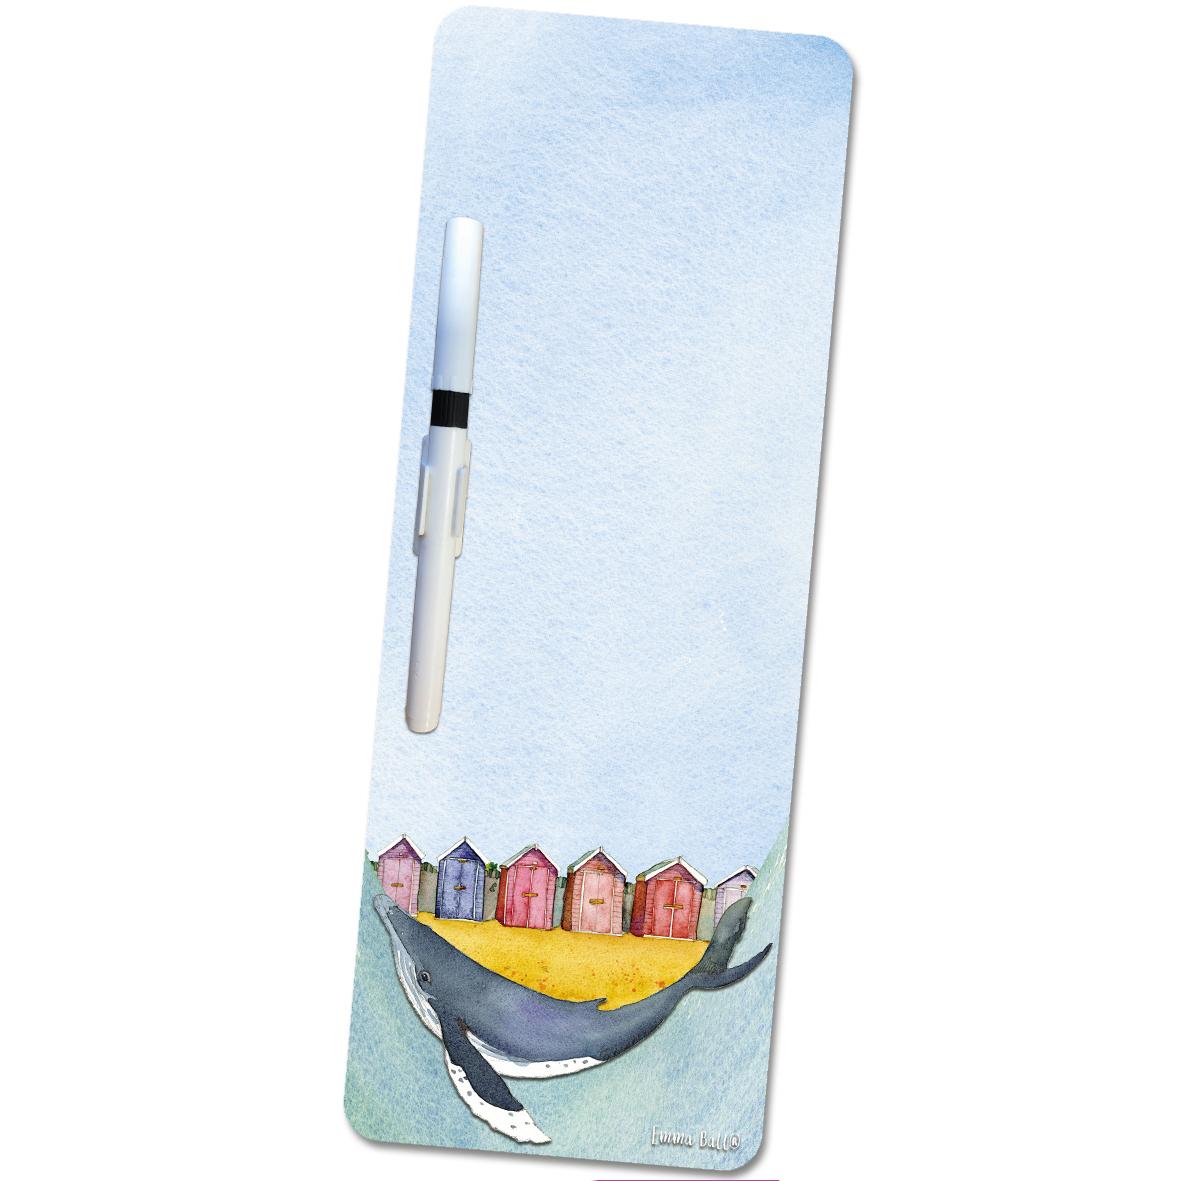 Sea Life Magnetic Wipeboard